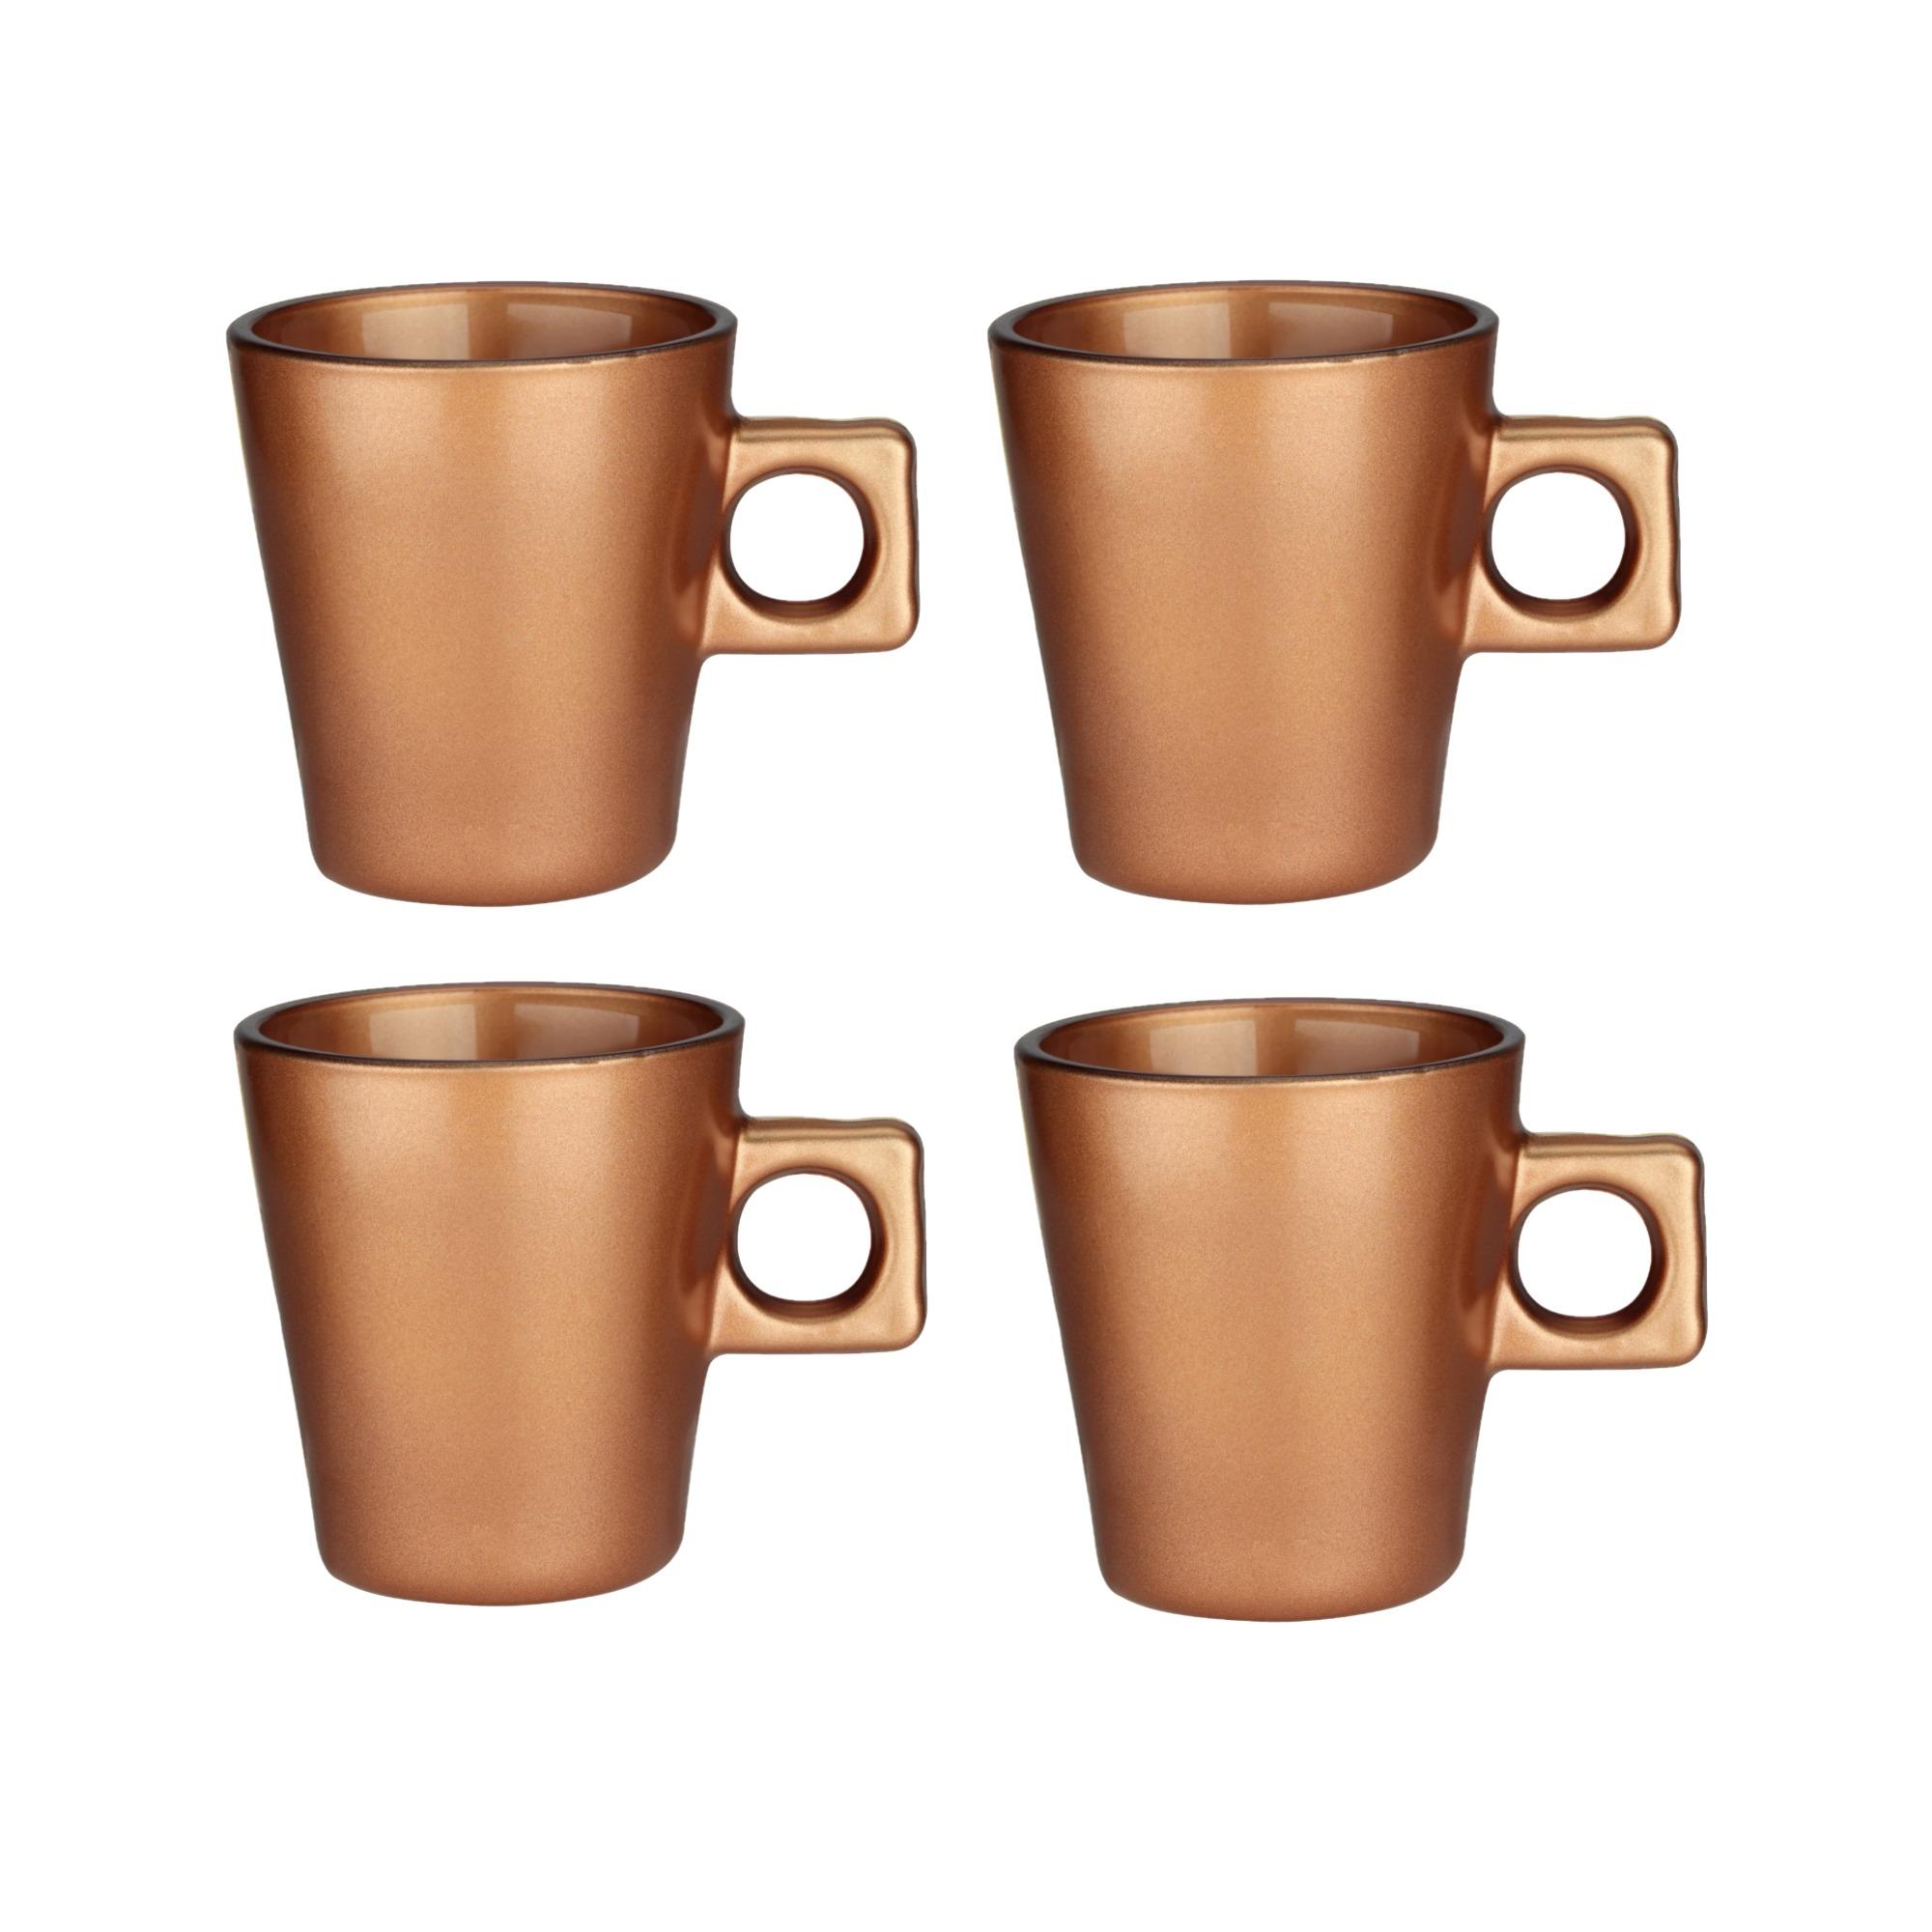 Jogo de Xicaras Plain Coffee de Vidro 80 ml 04 Pecas - Full Fit